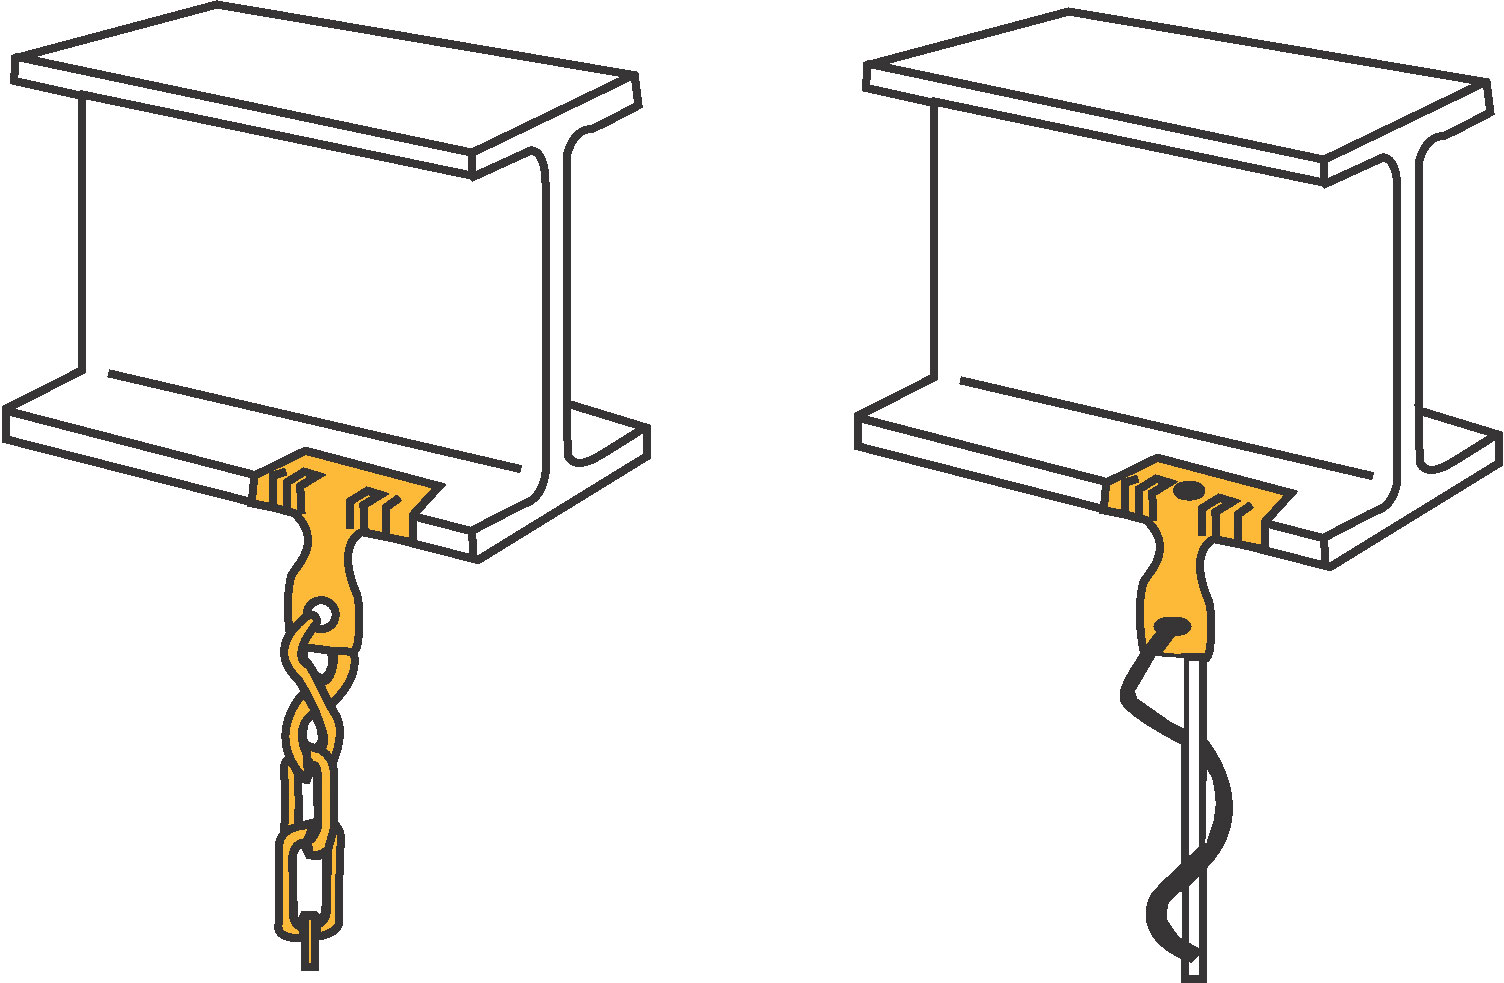 Diamond Tool: CADDY 4H24 Hammer-On Flange Clips